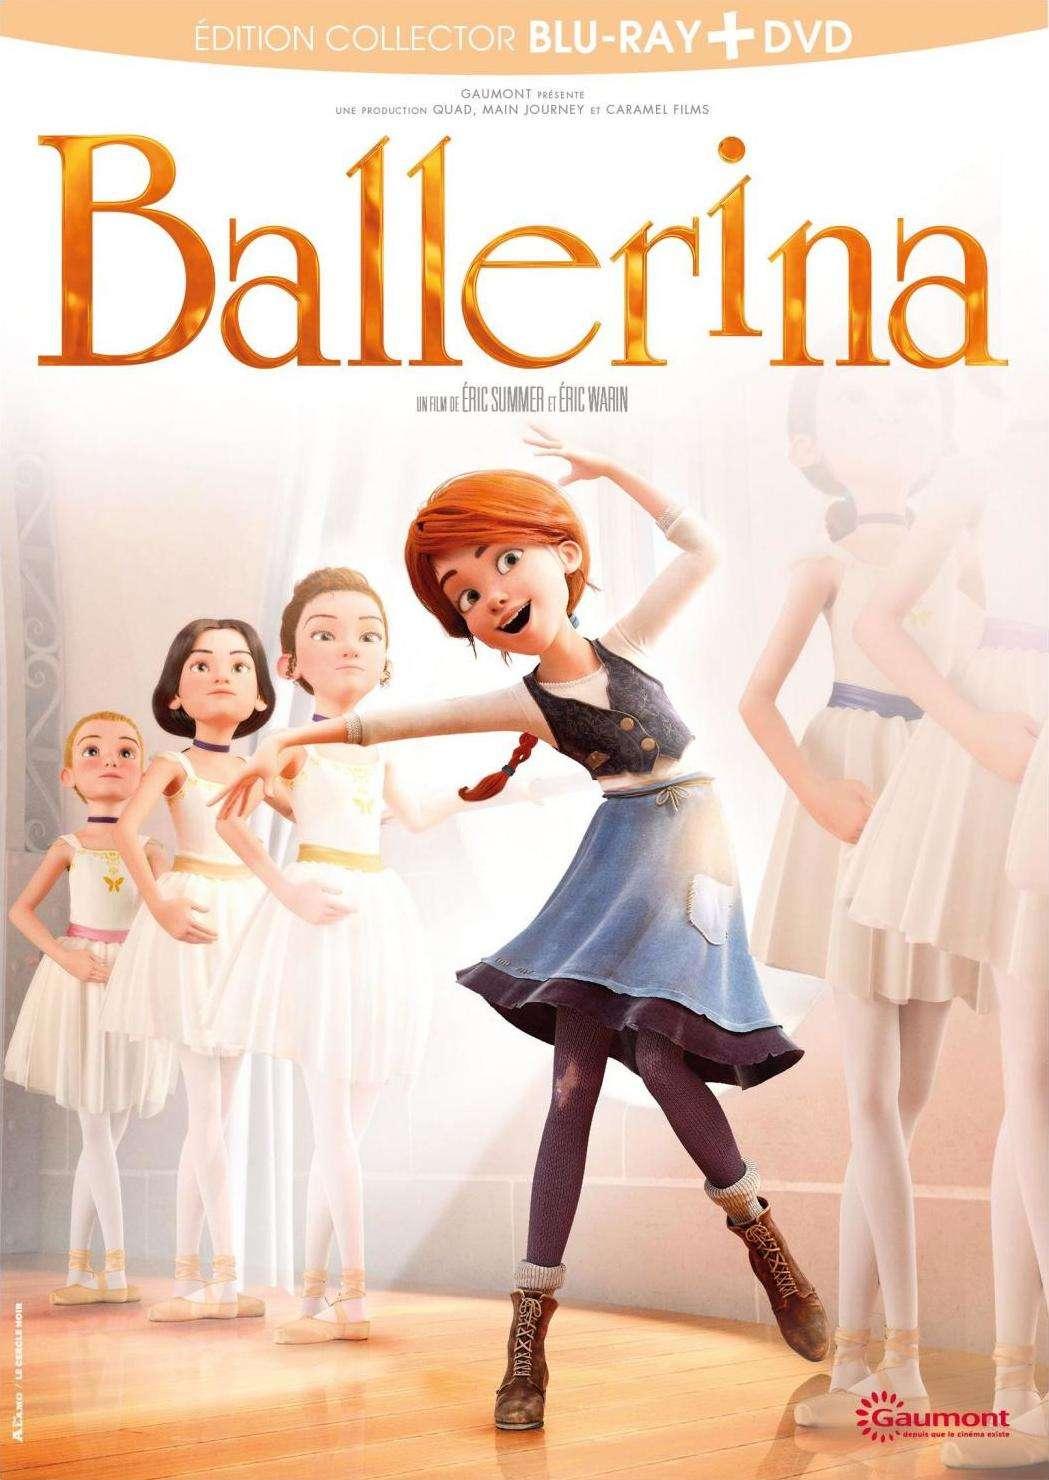 phim ballerina 2016 1080p bluray remux avc dts hd ma 5 1. Black Bedroom Furniture Sets. Home Design Ideas